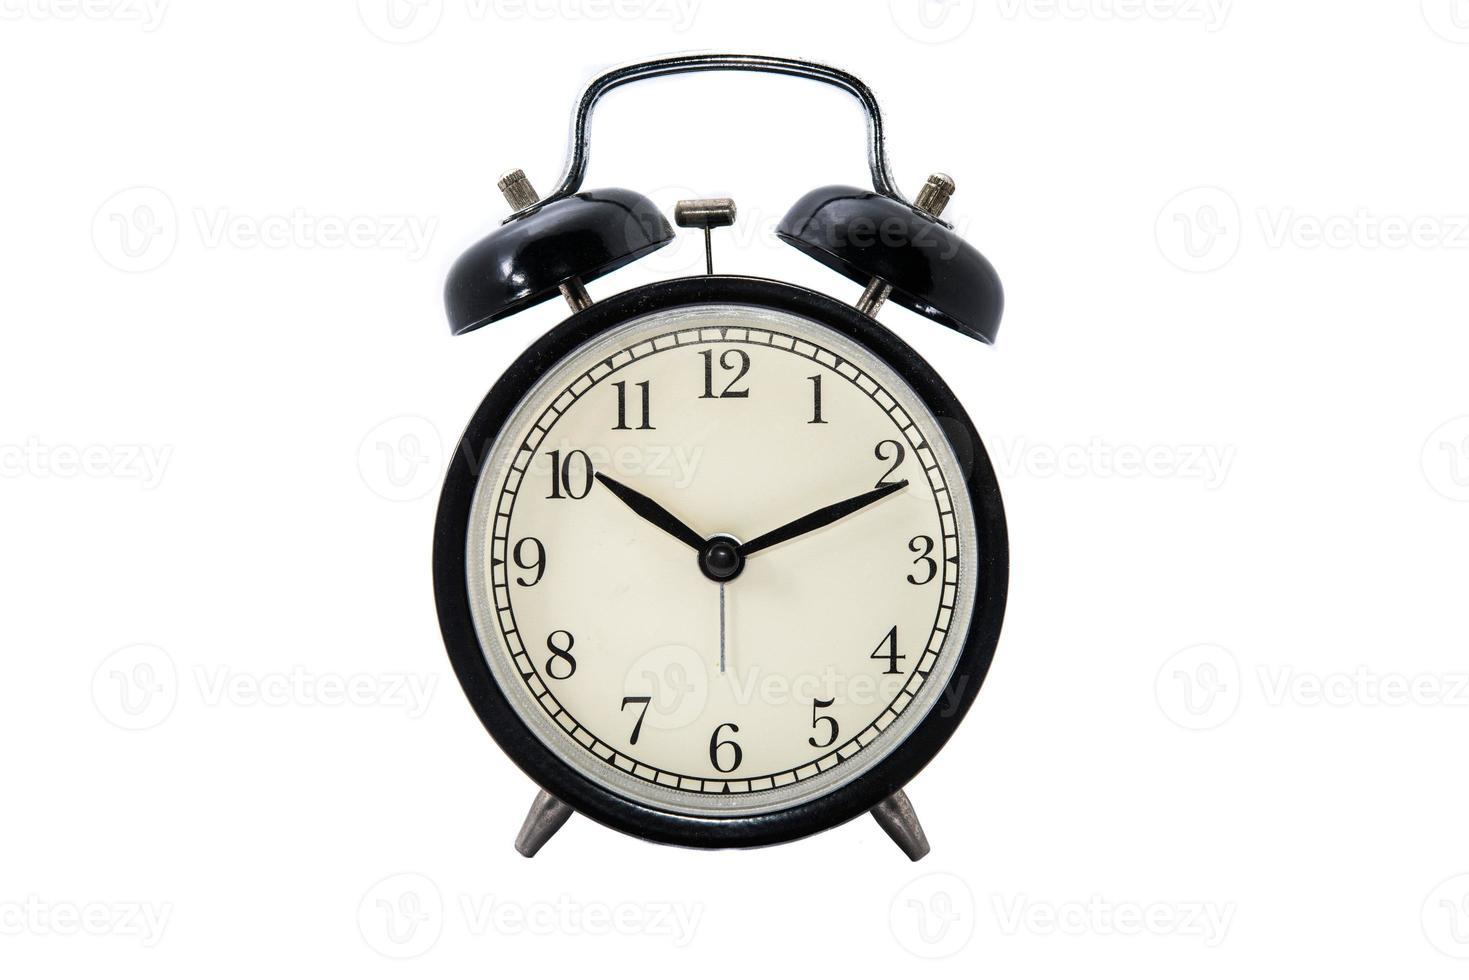 orologio su sfondi bianchi foto